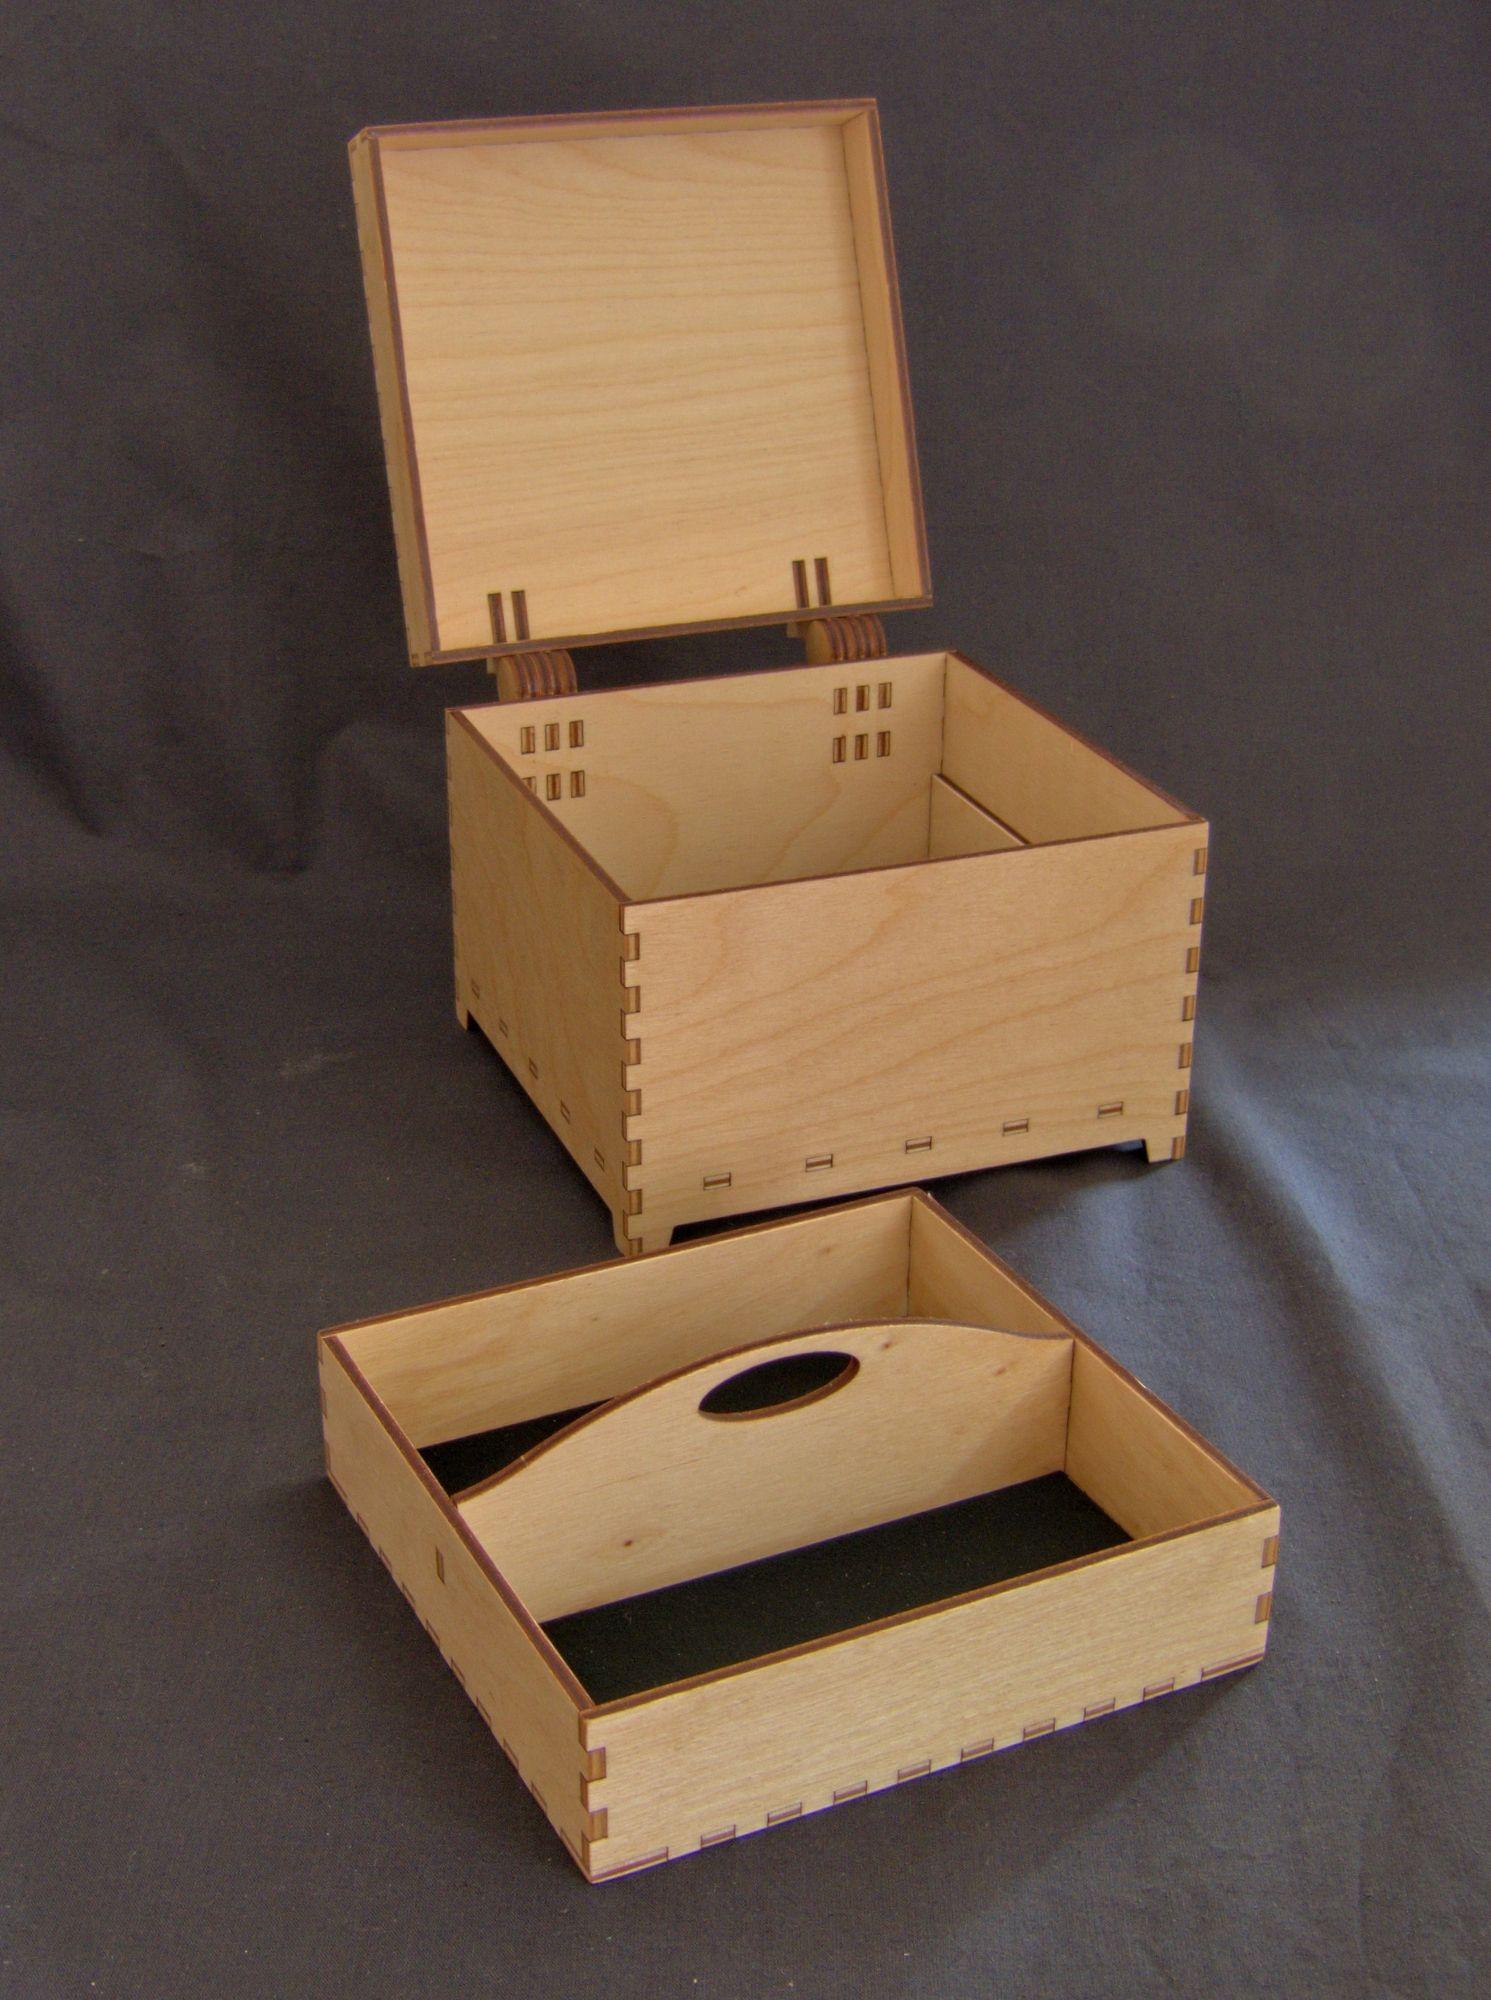 lasercut birch ply box, 16x16x12cm. | изделия из дерева ... for Laser Cut Cardboard Box  34eri